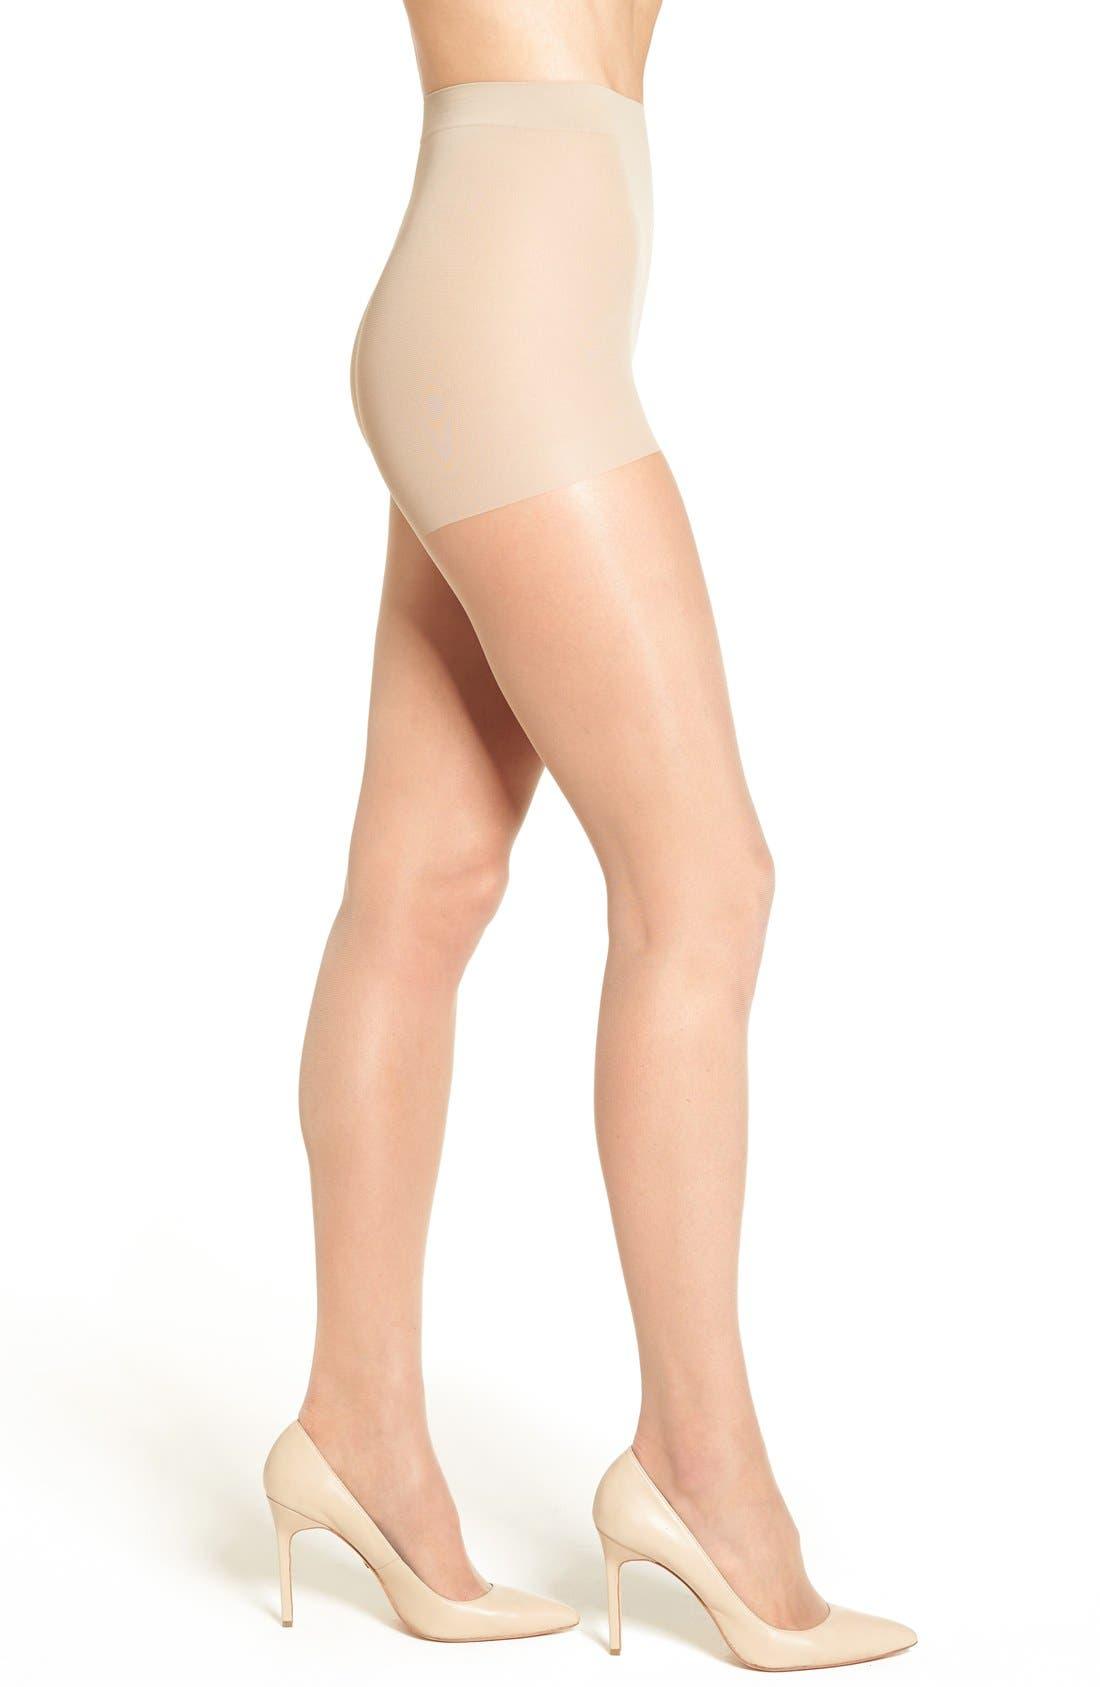 NORDSTROM Control Top Pantyhose